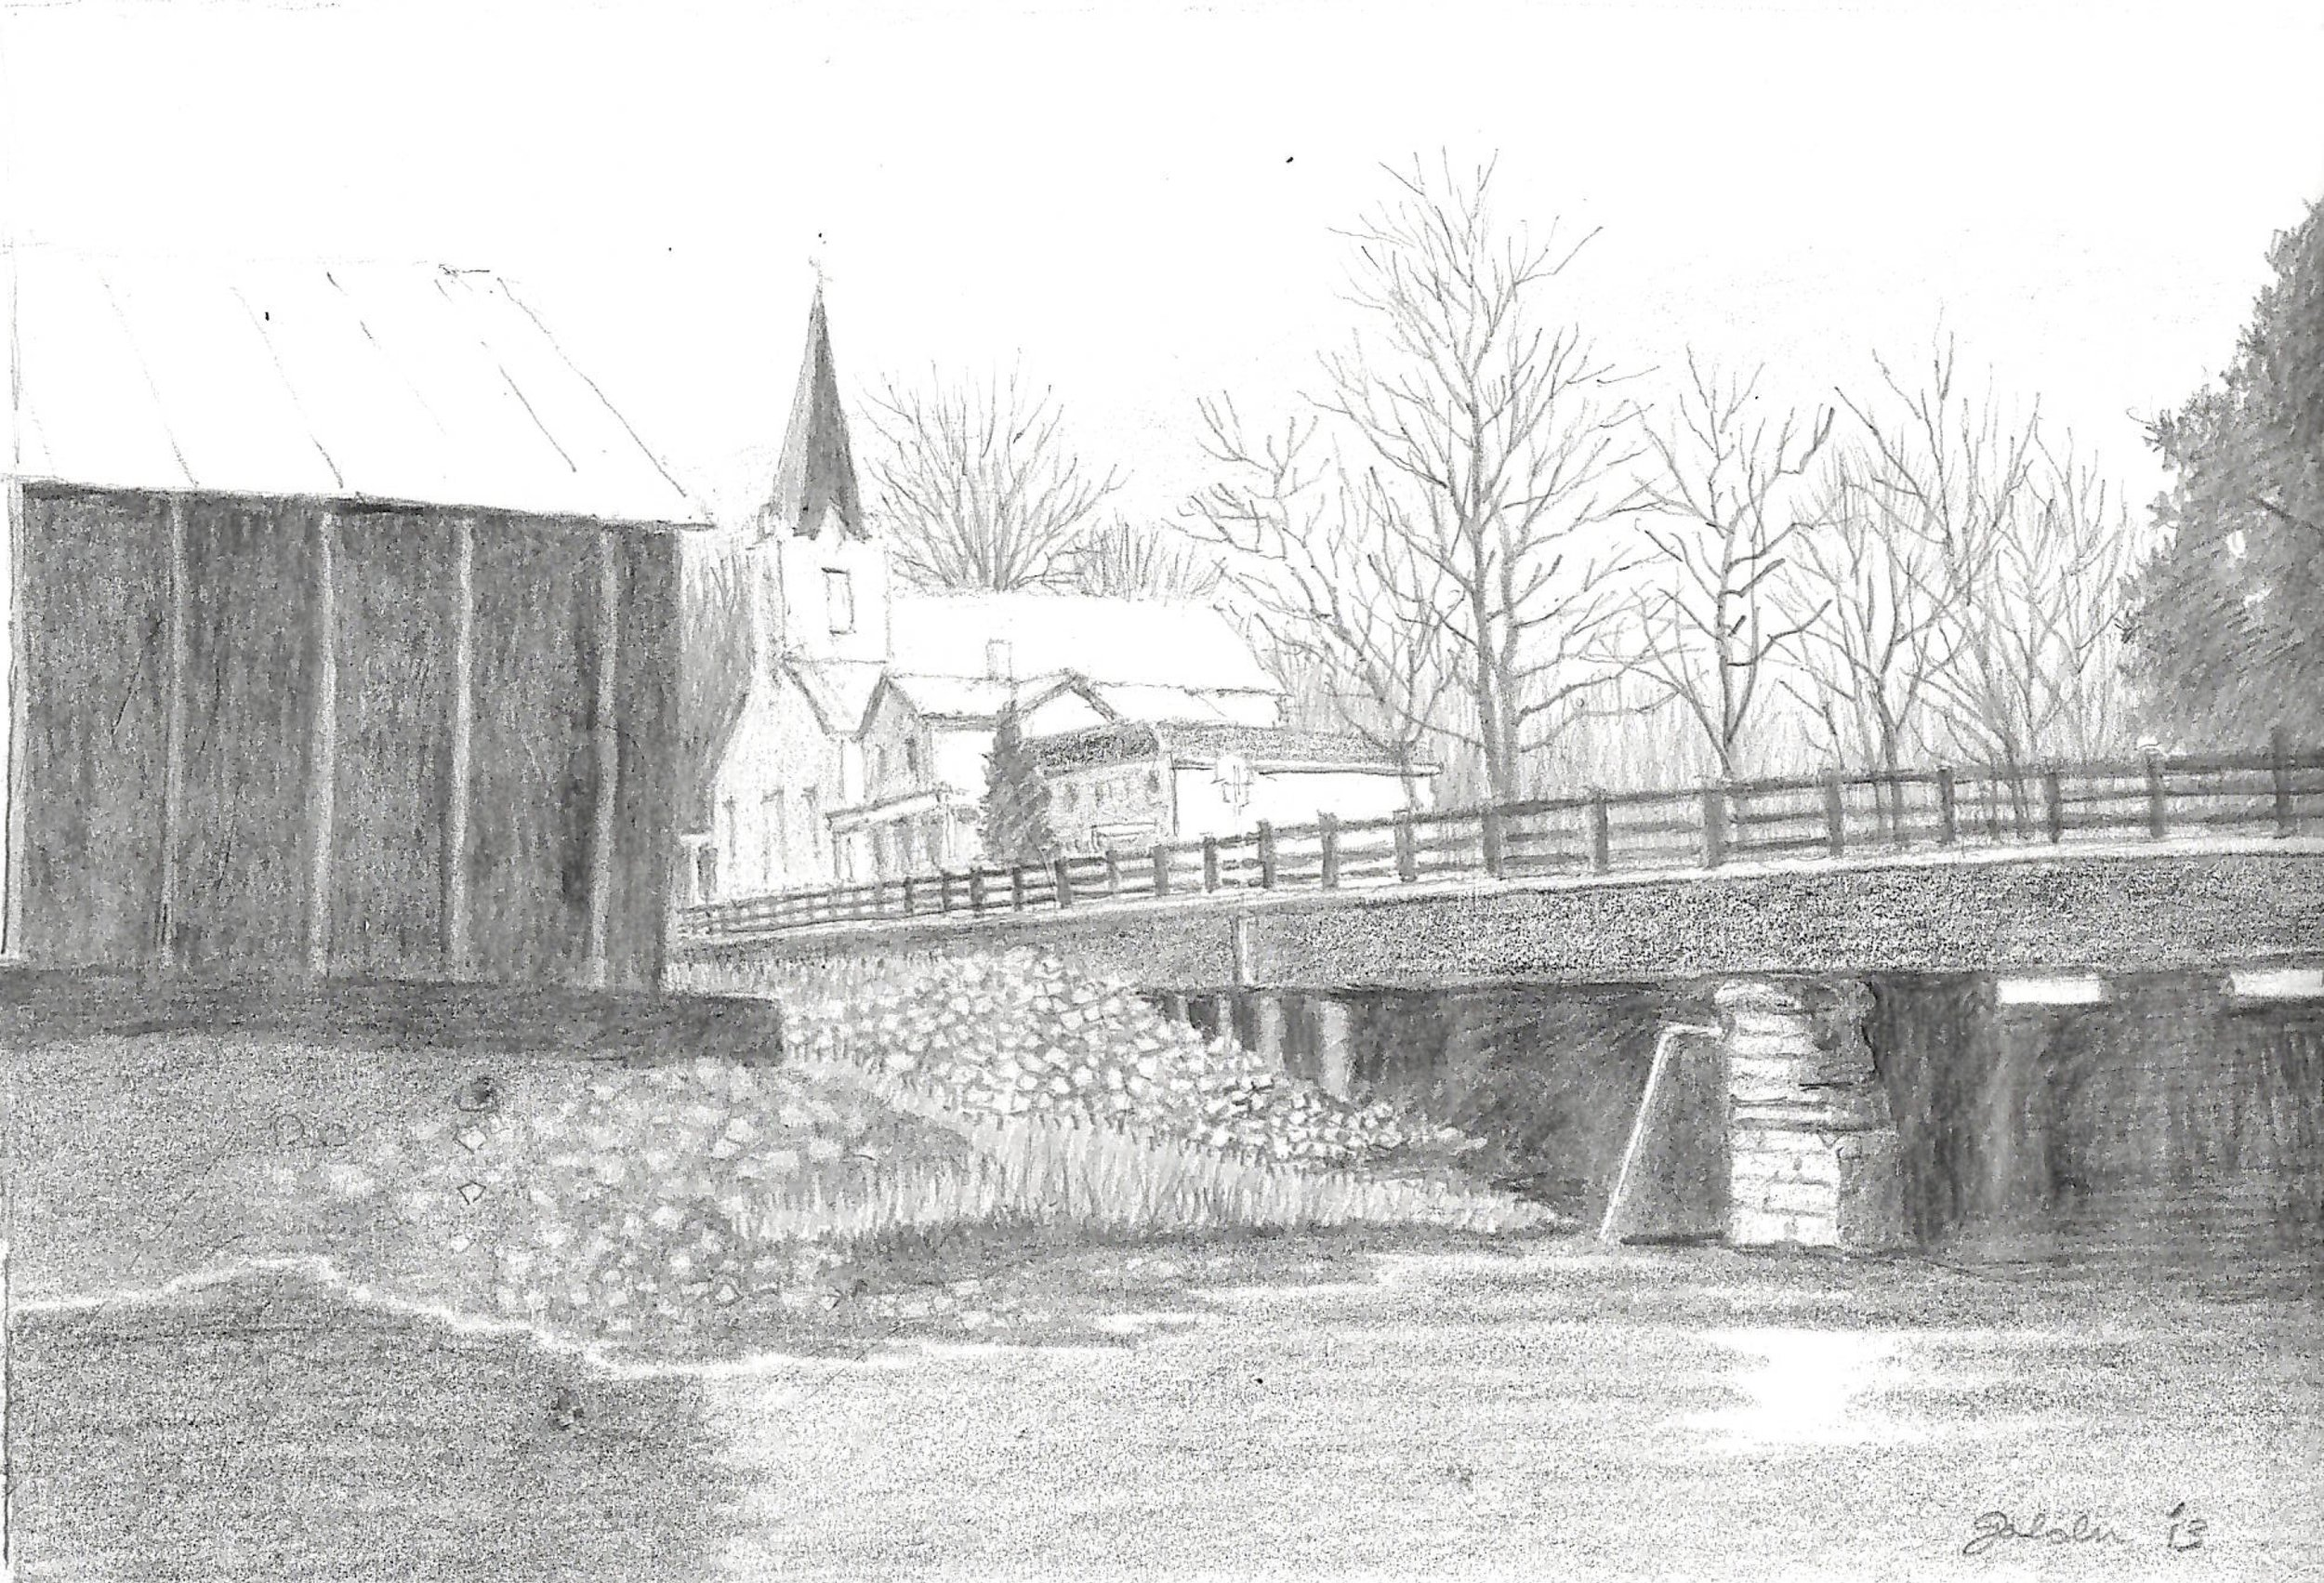 Covered Bridge (upper New York state) (2013